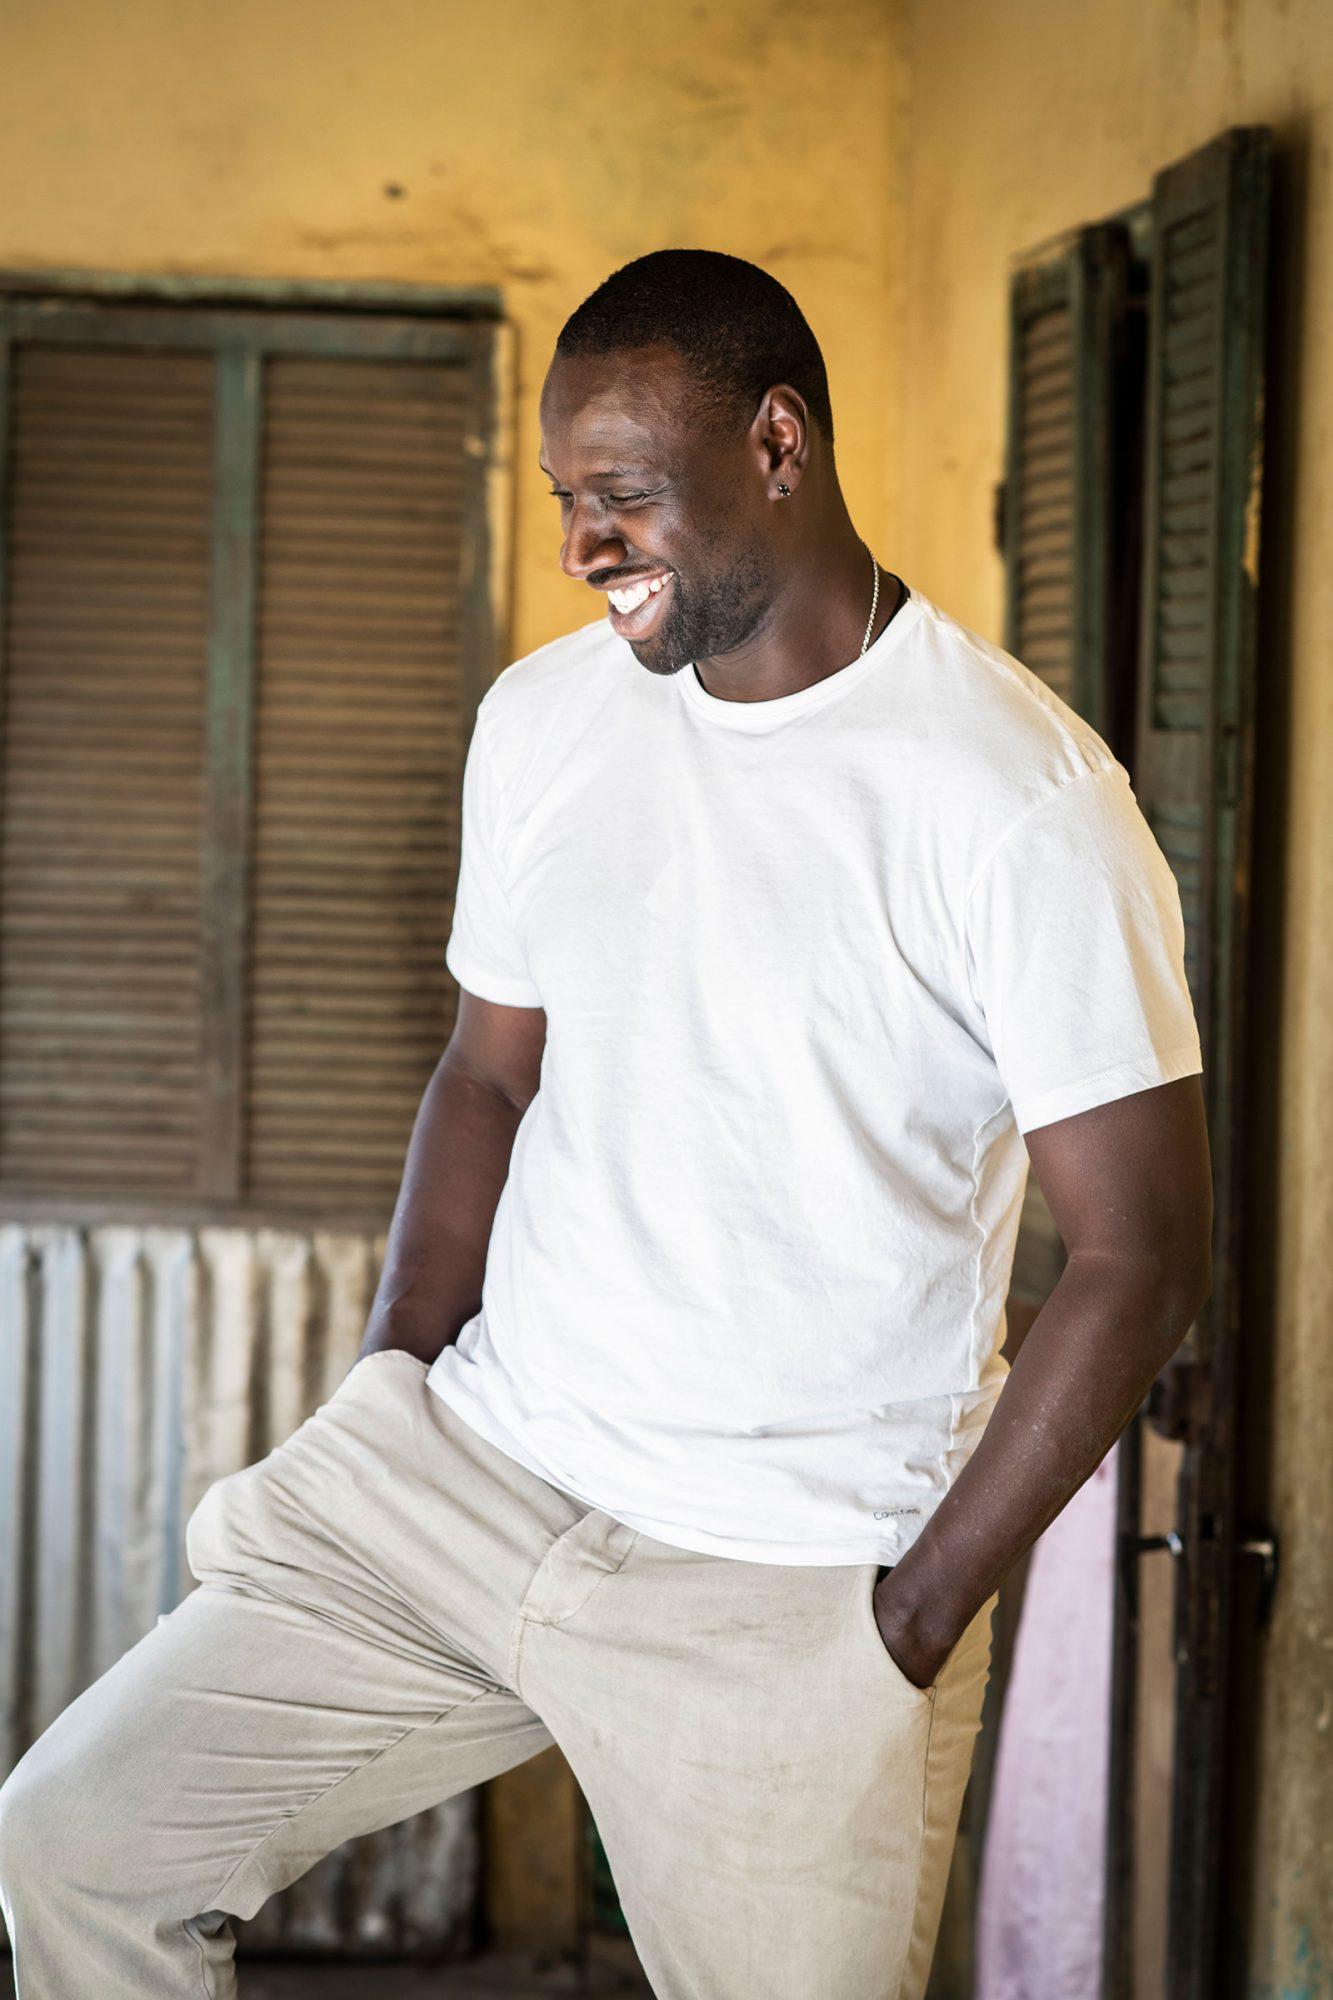 Omar Sy on set for a film in Senegal on Dec. 10, 2018.